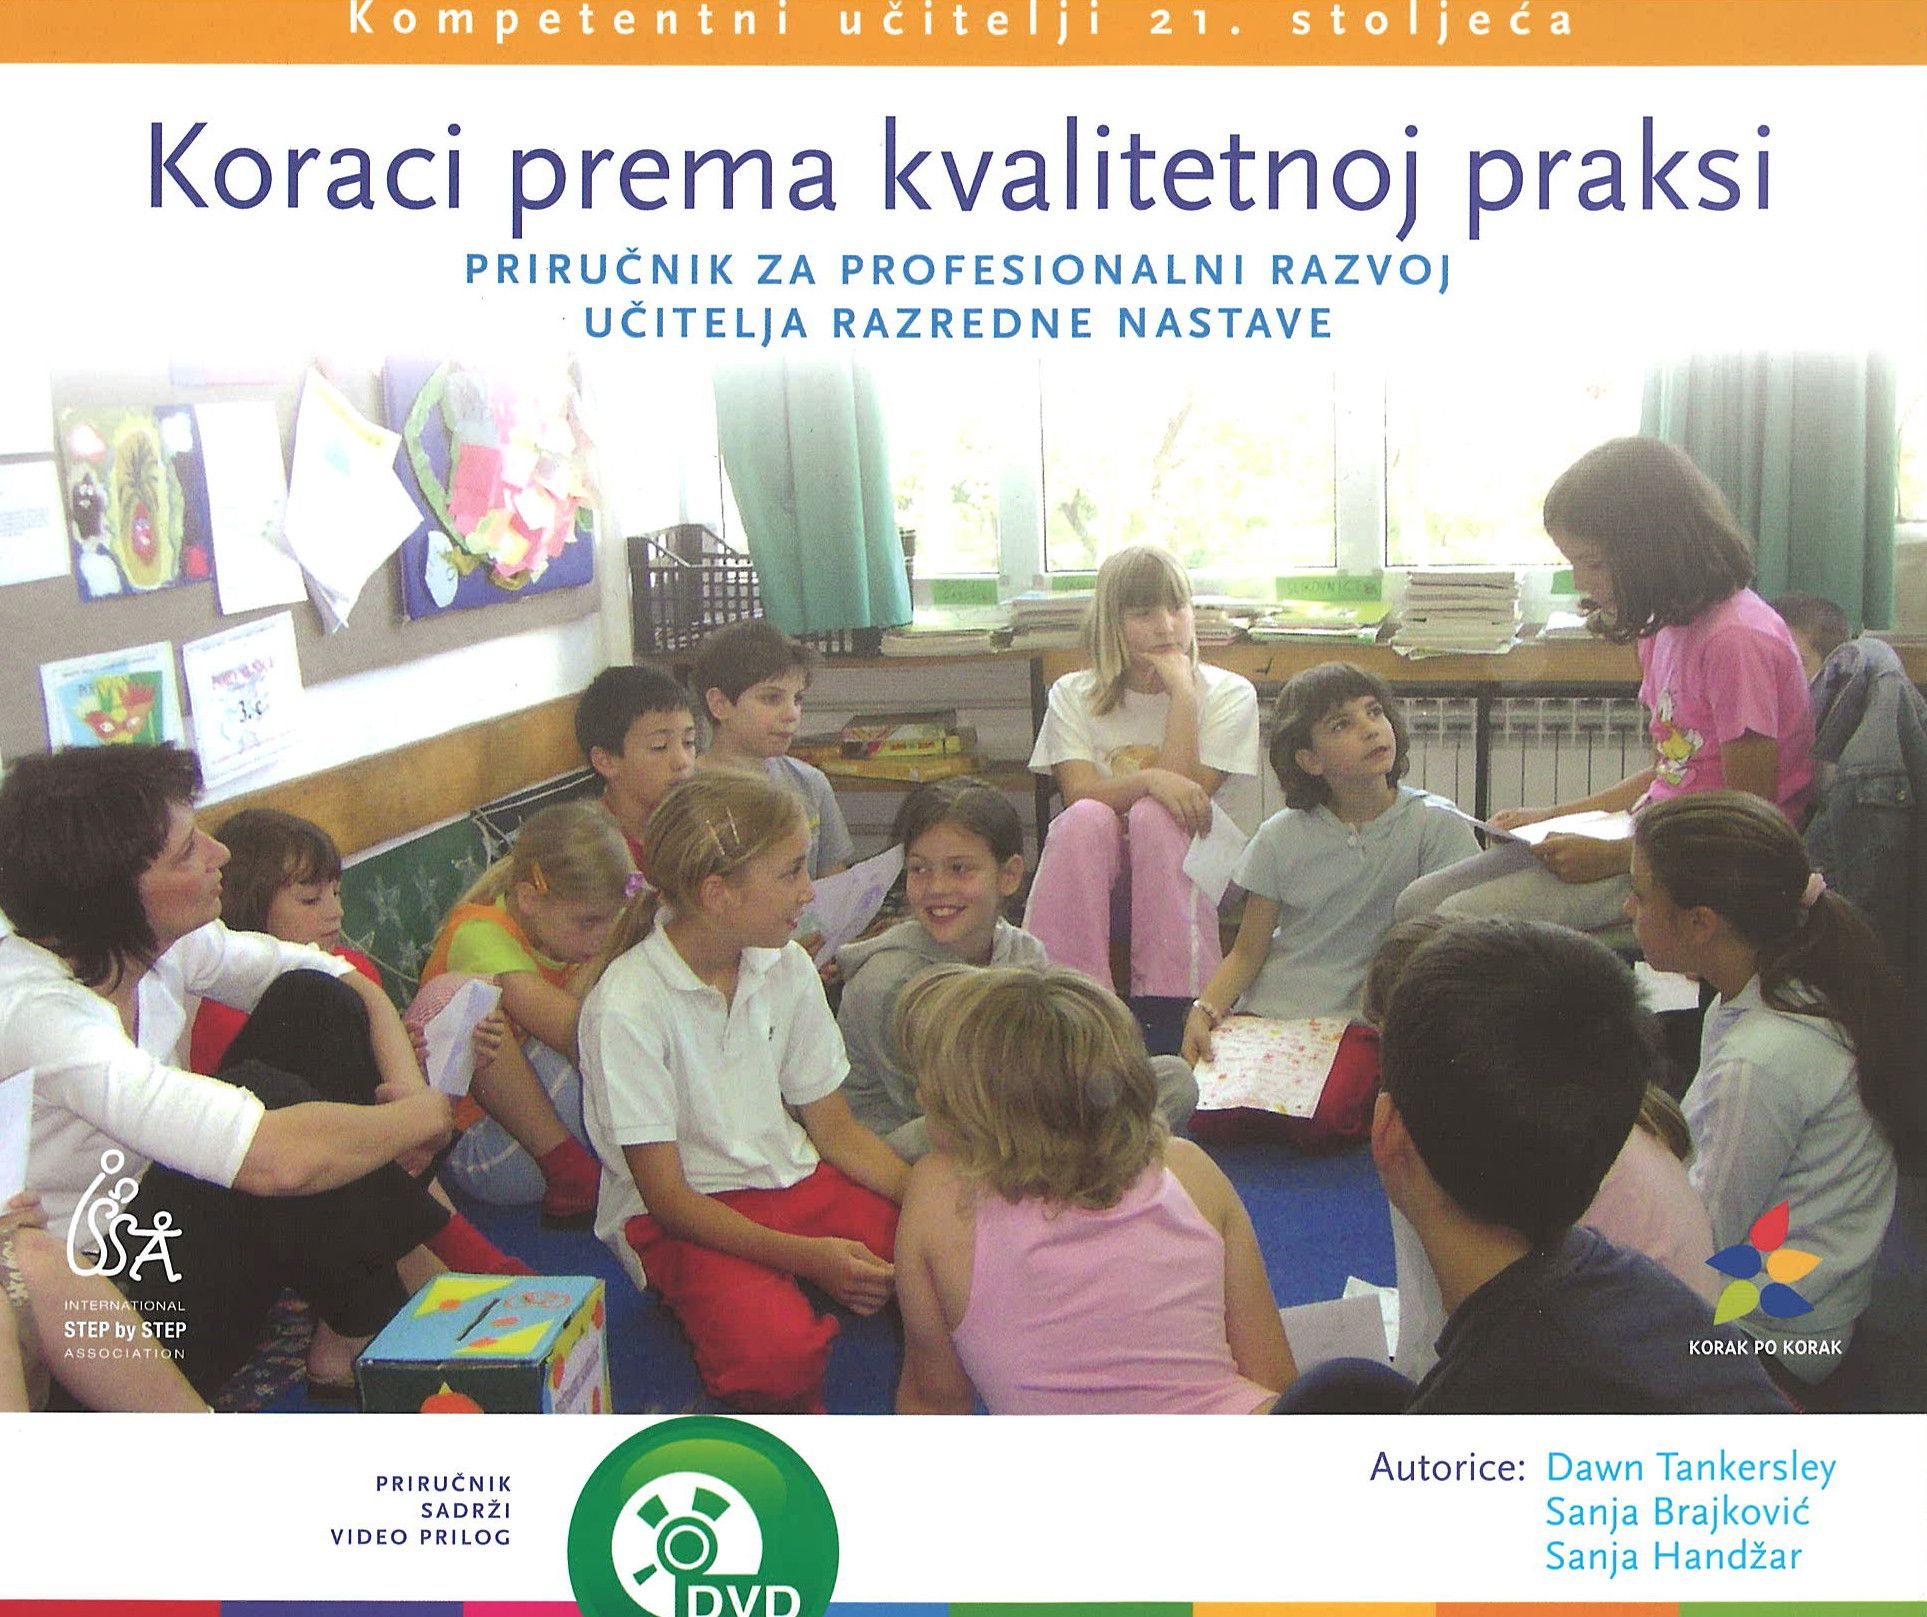 KORACI PREMA KVALITETNOJ PRAKSI - Priručnik za profesionalni razvoj učitelja